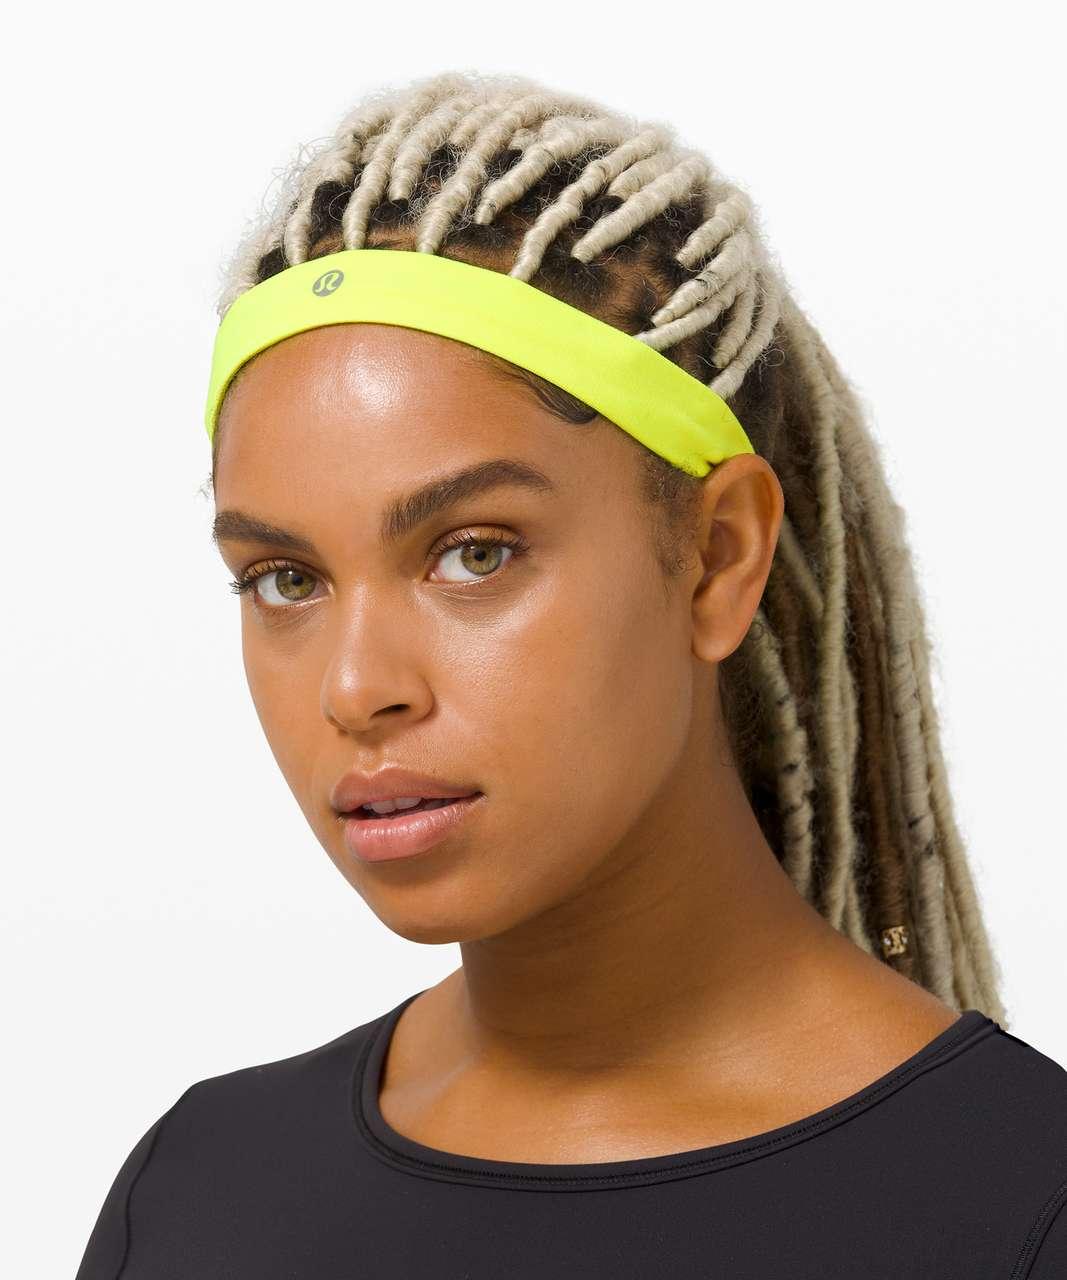 Lululemon Cardio Cross Trainer Headband - Yellow Highlight